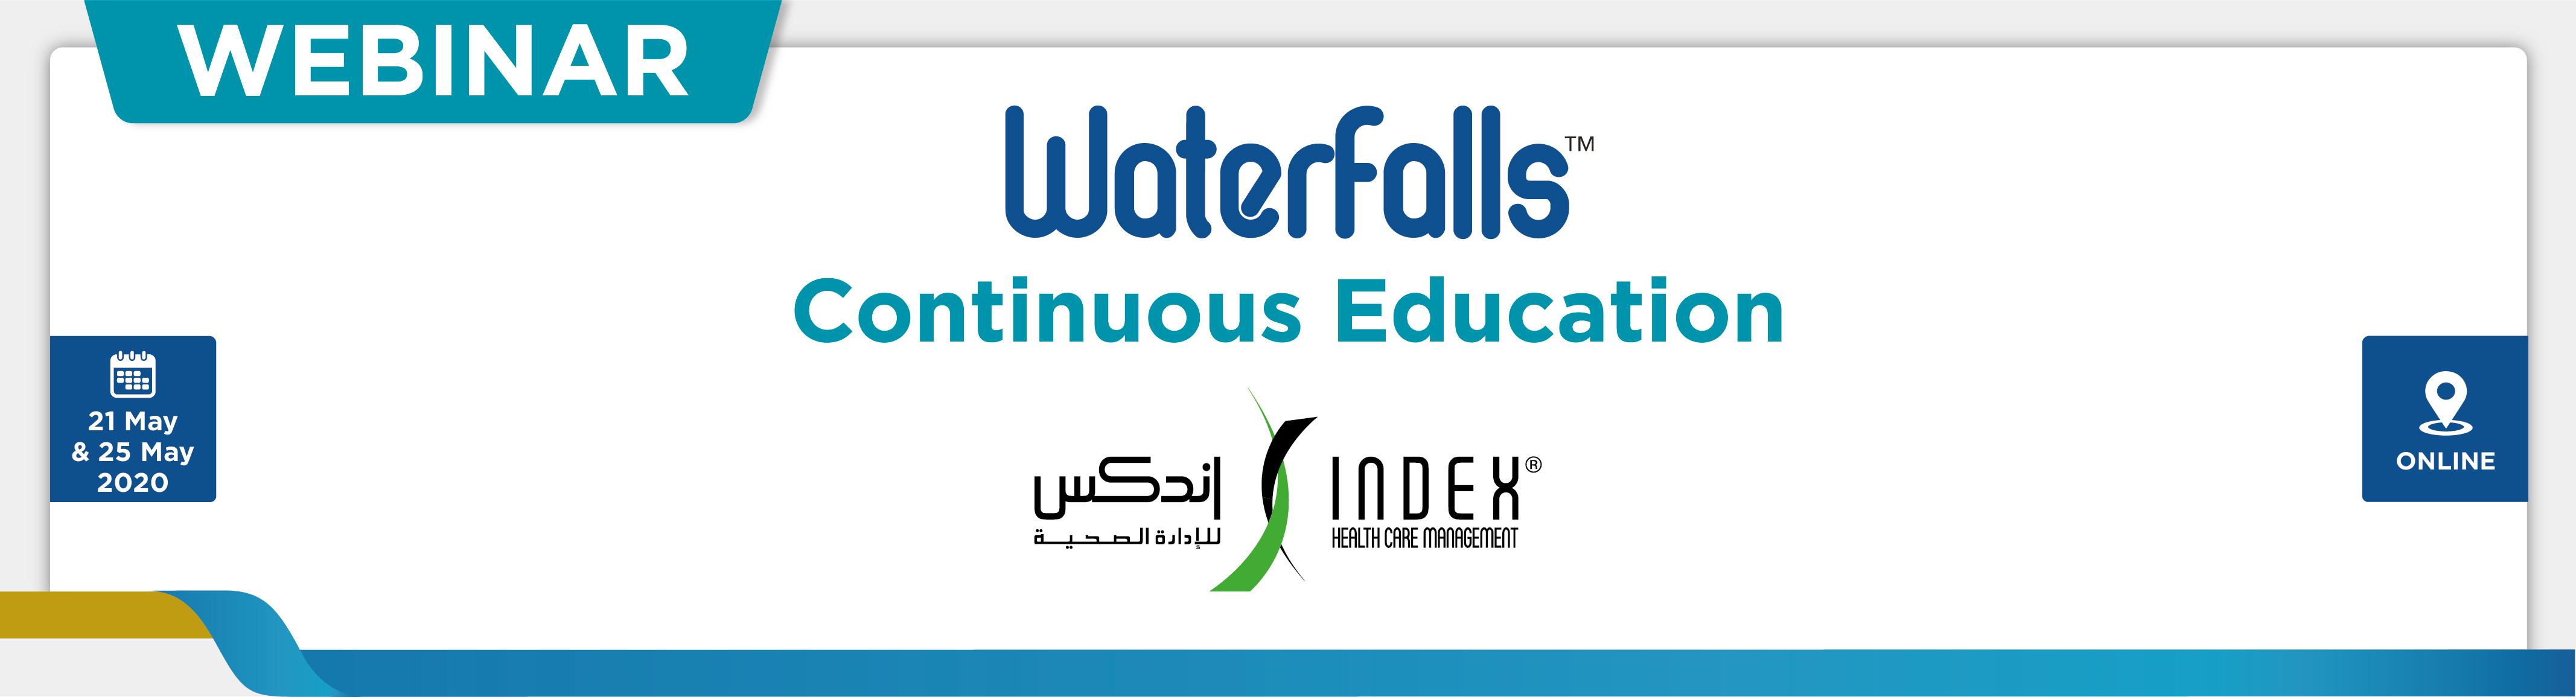 IHCM Webinar Waterfalls Education, May 21